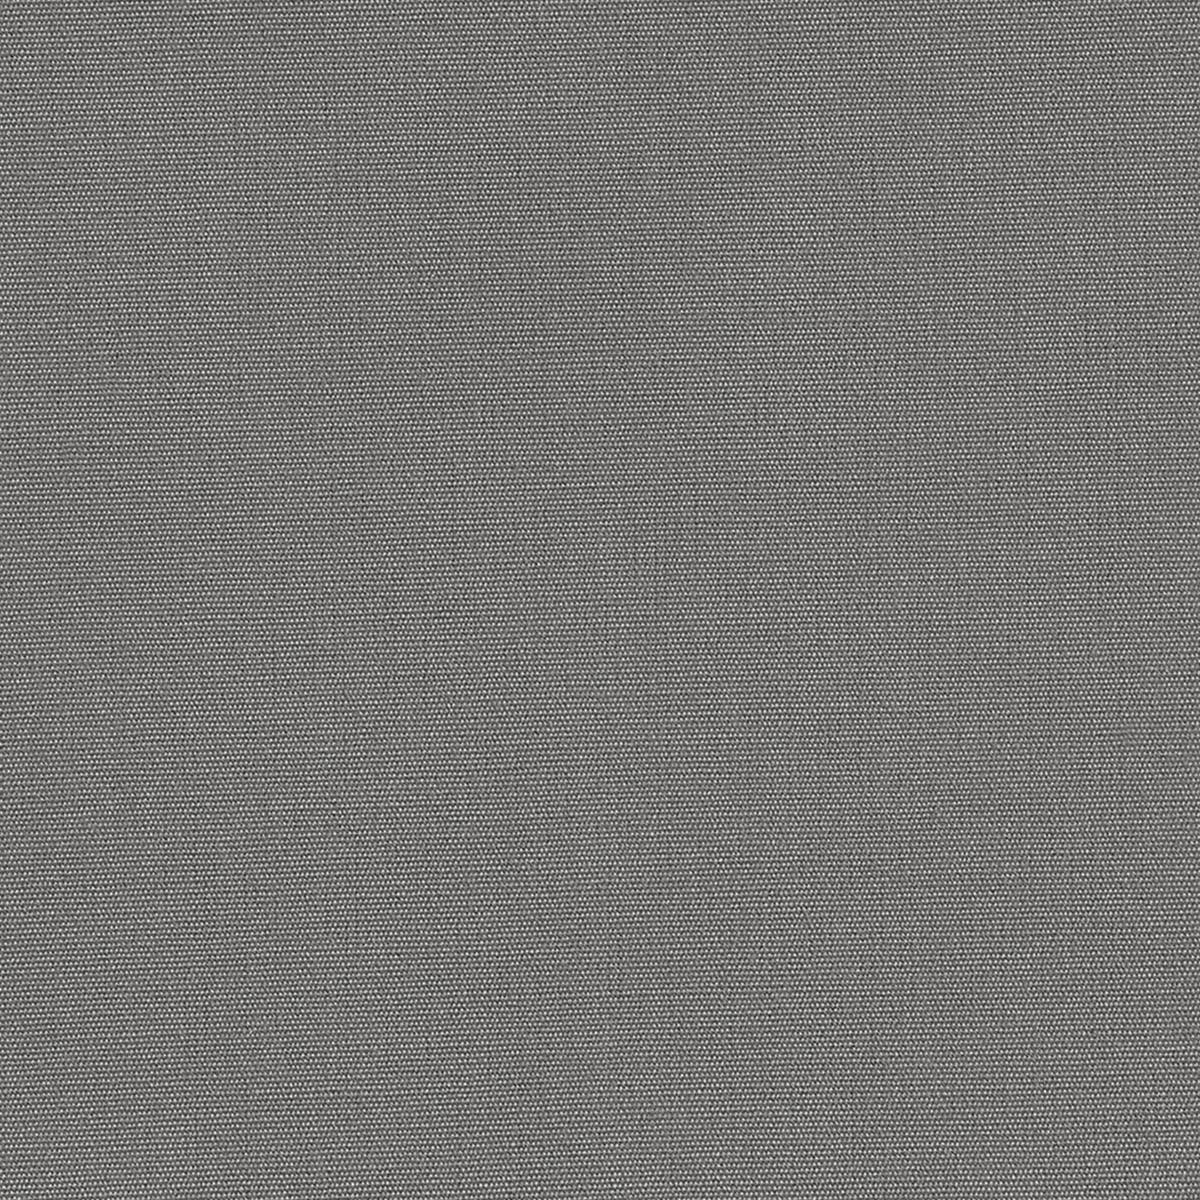 Tecido Lonita Inout Dralon® &Bull; - 2 &Bull; Deezign